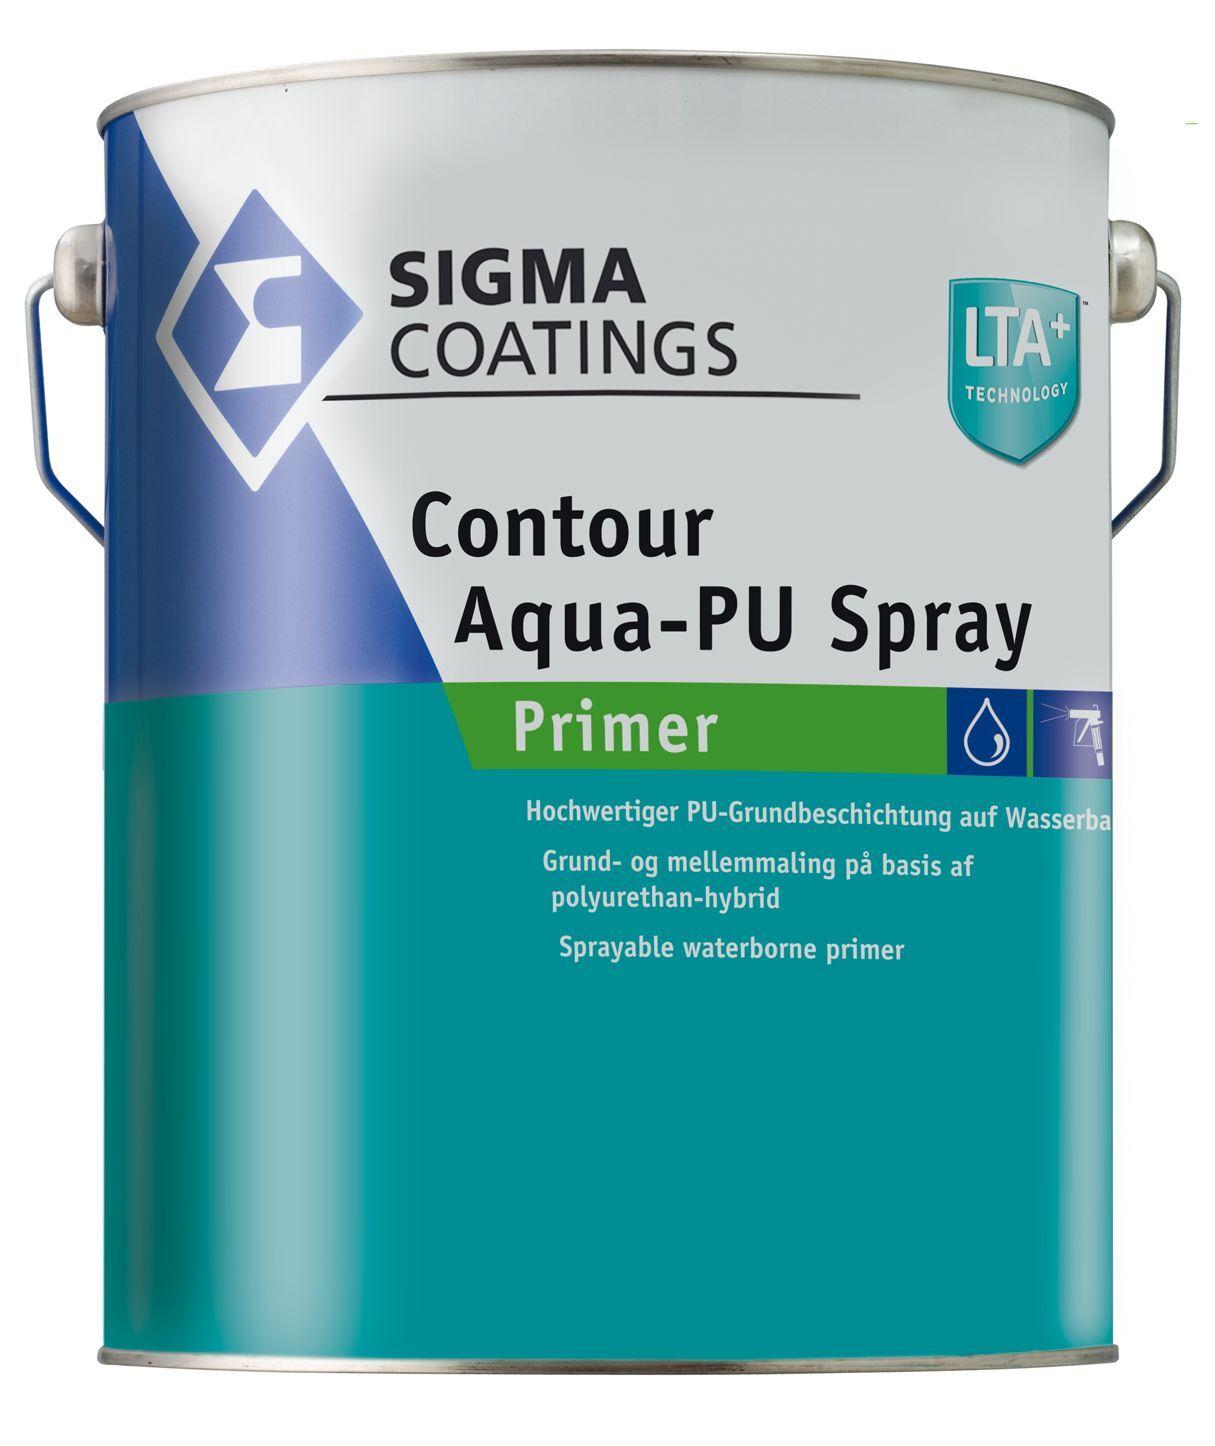 4x SIGMA Contour Aqua-PU Spray Primer 5 Liter- sehr gute Haftung